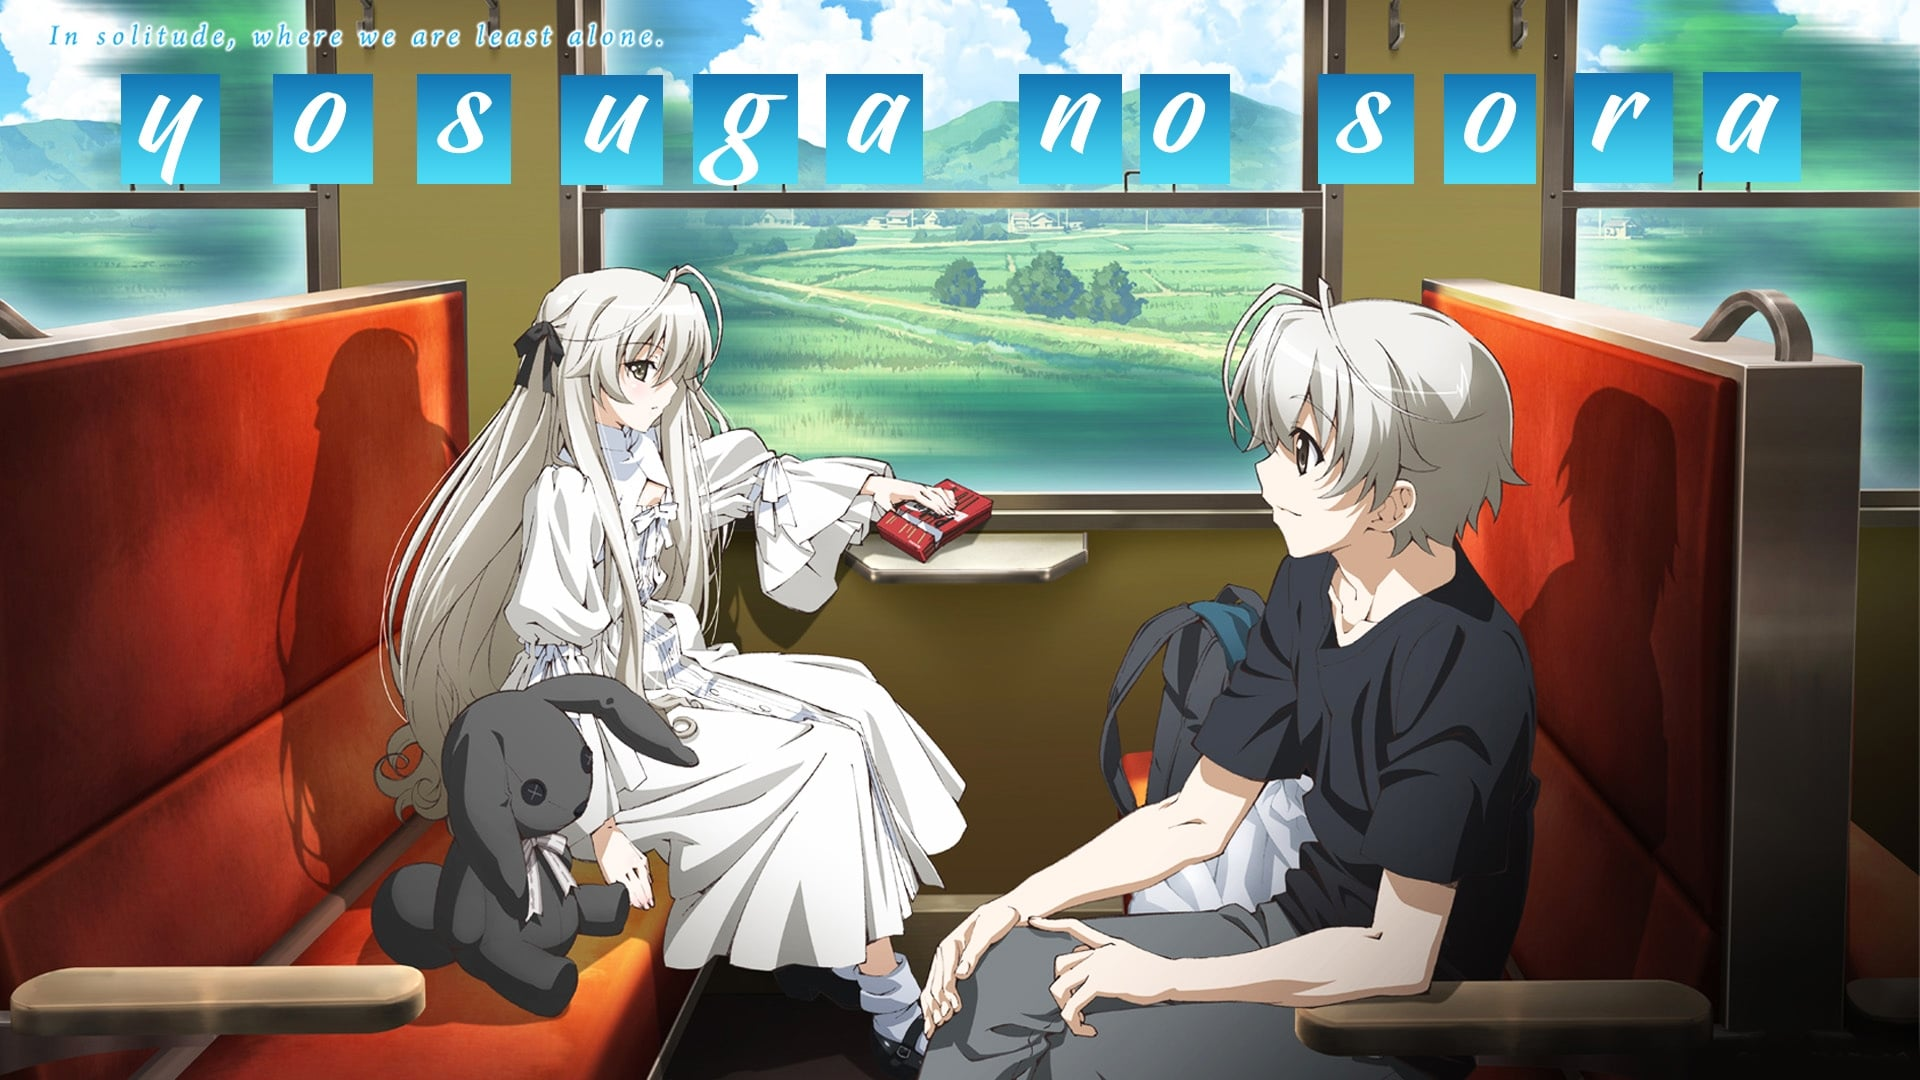 Yosuga no Sora Backdrop